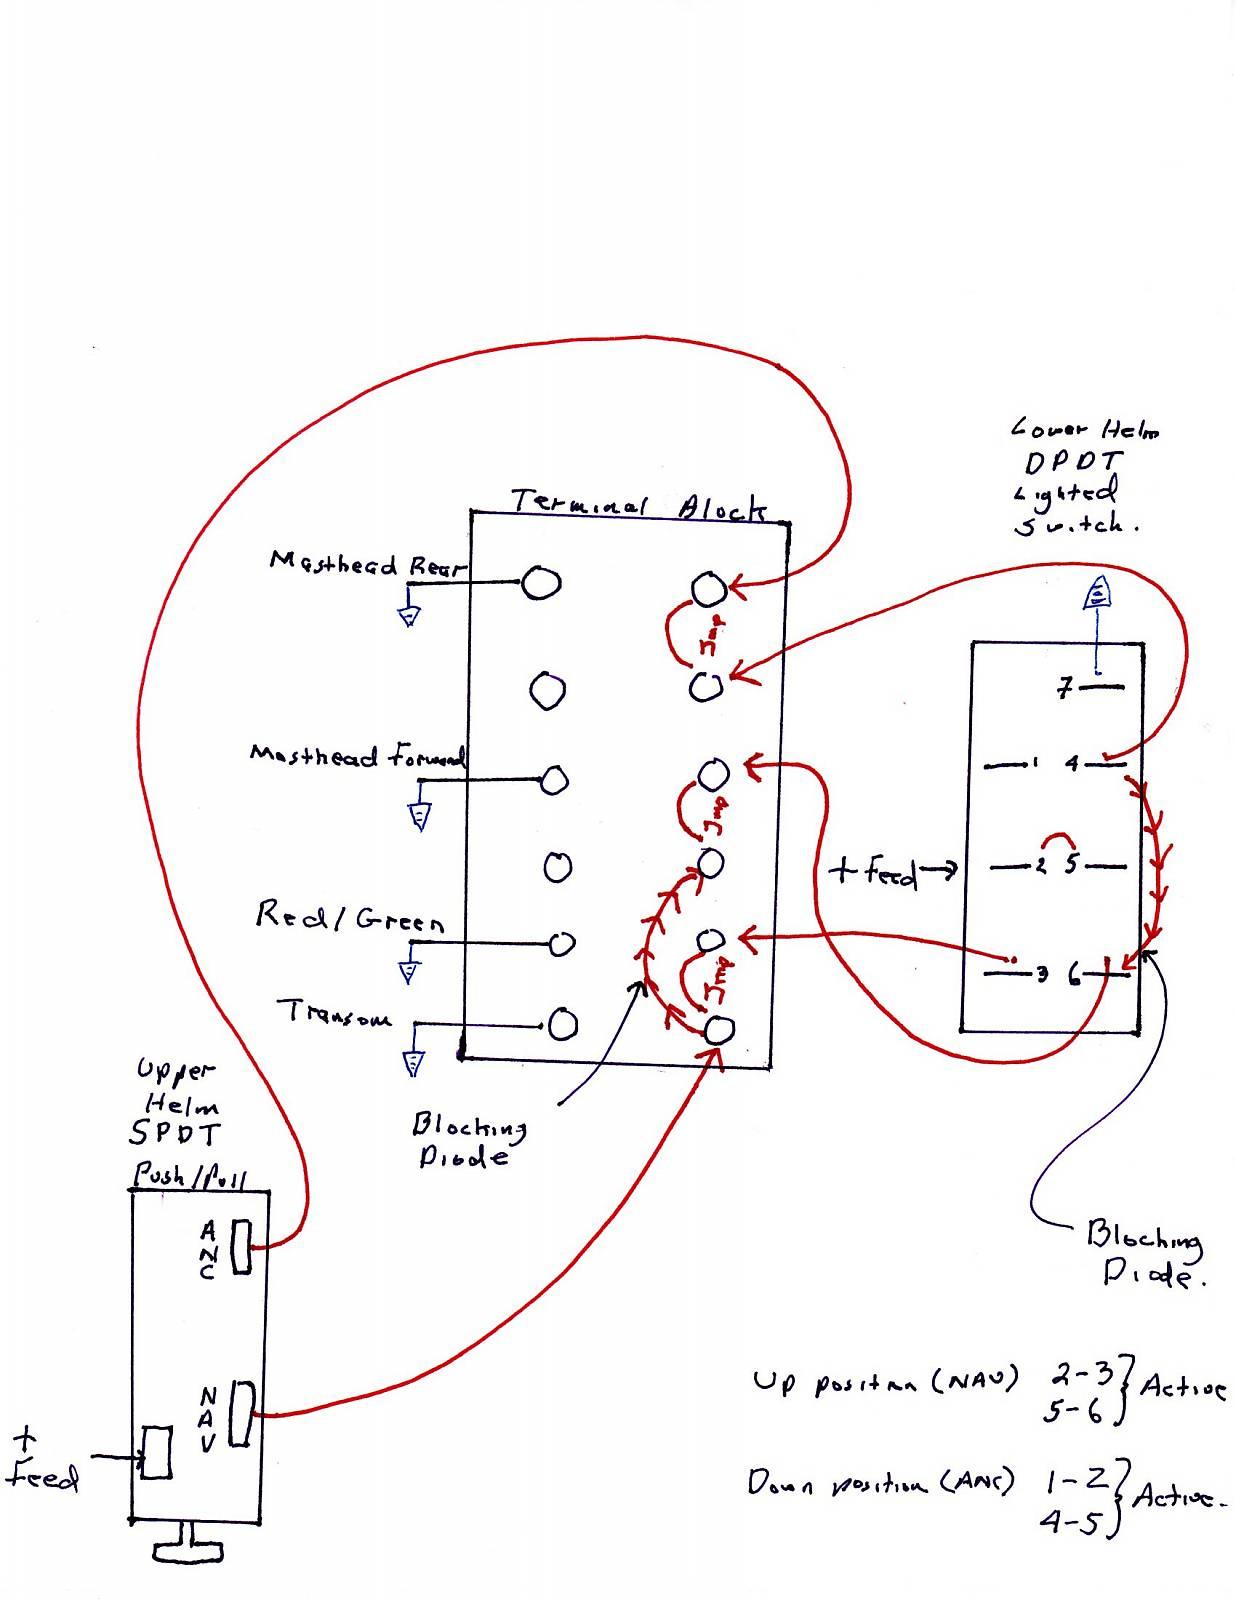 Wiring diagram boat lights free download wiring diagram xwiaw boat rh xwiaw us